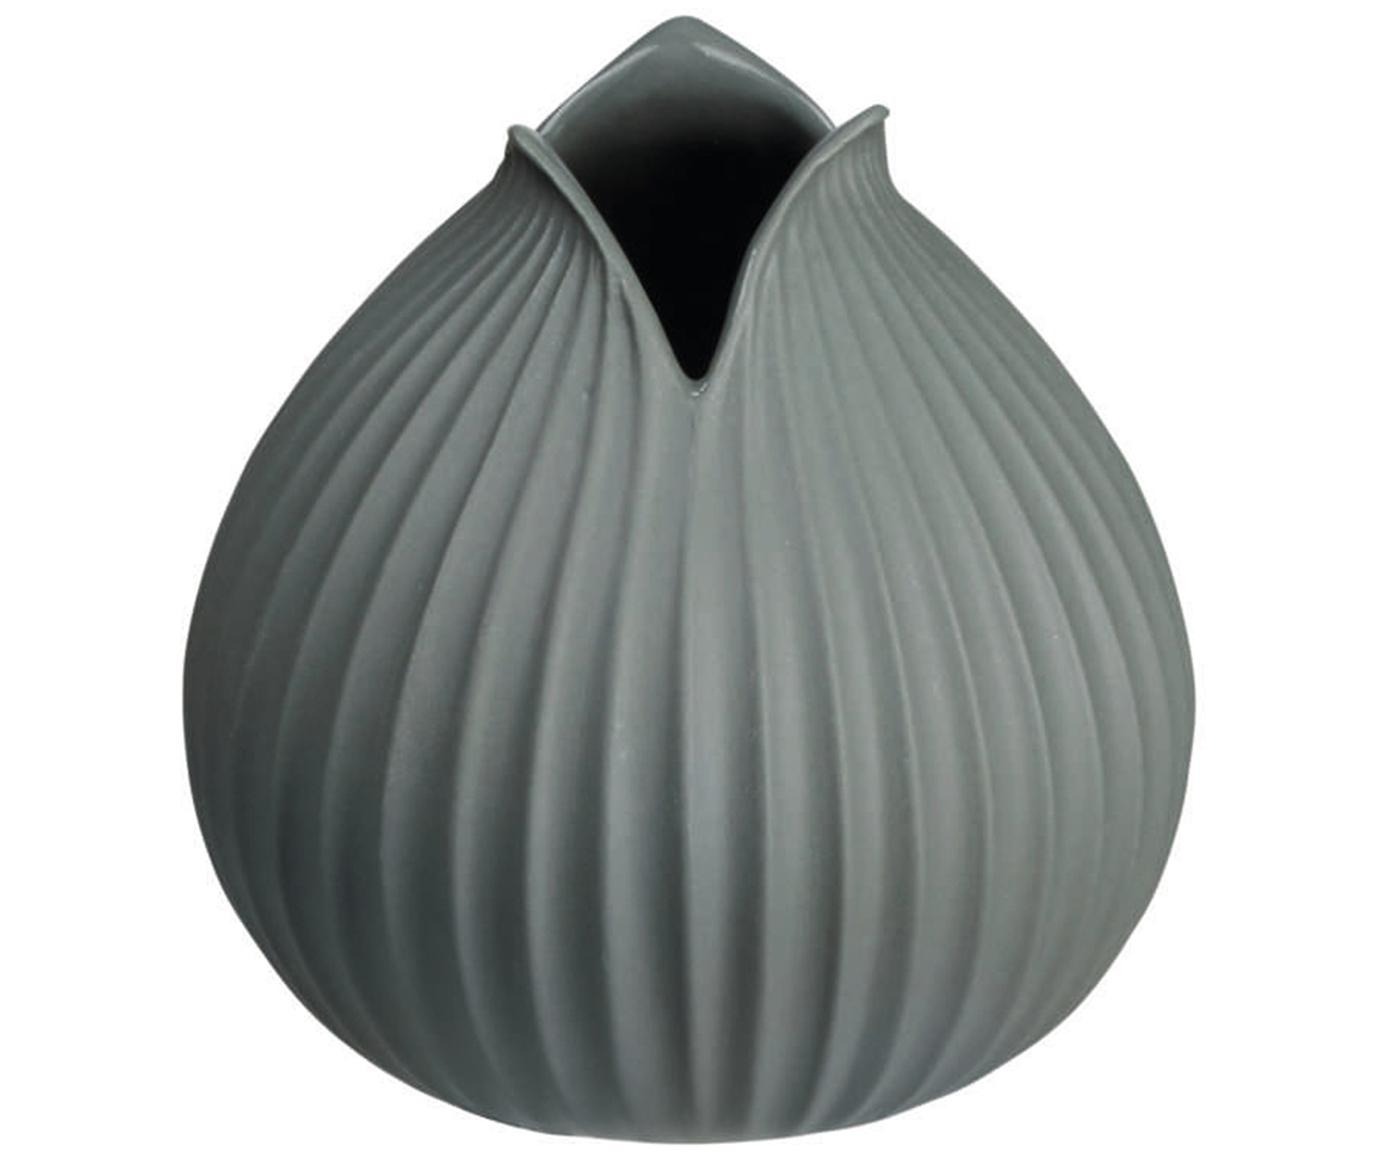 Jarrón artesanal de porcelana Yoko, Porcelana, Gris, Ø 10 x Al 11 cm